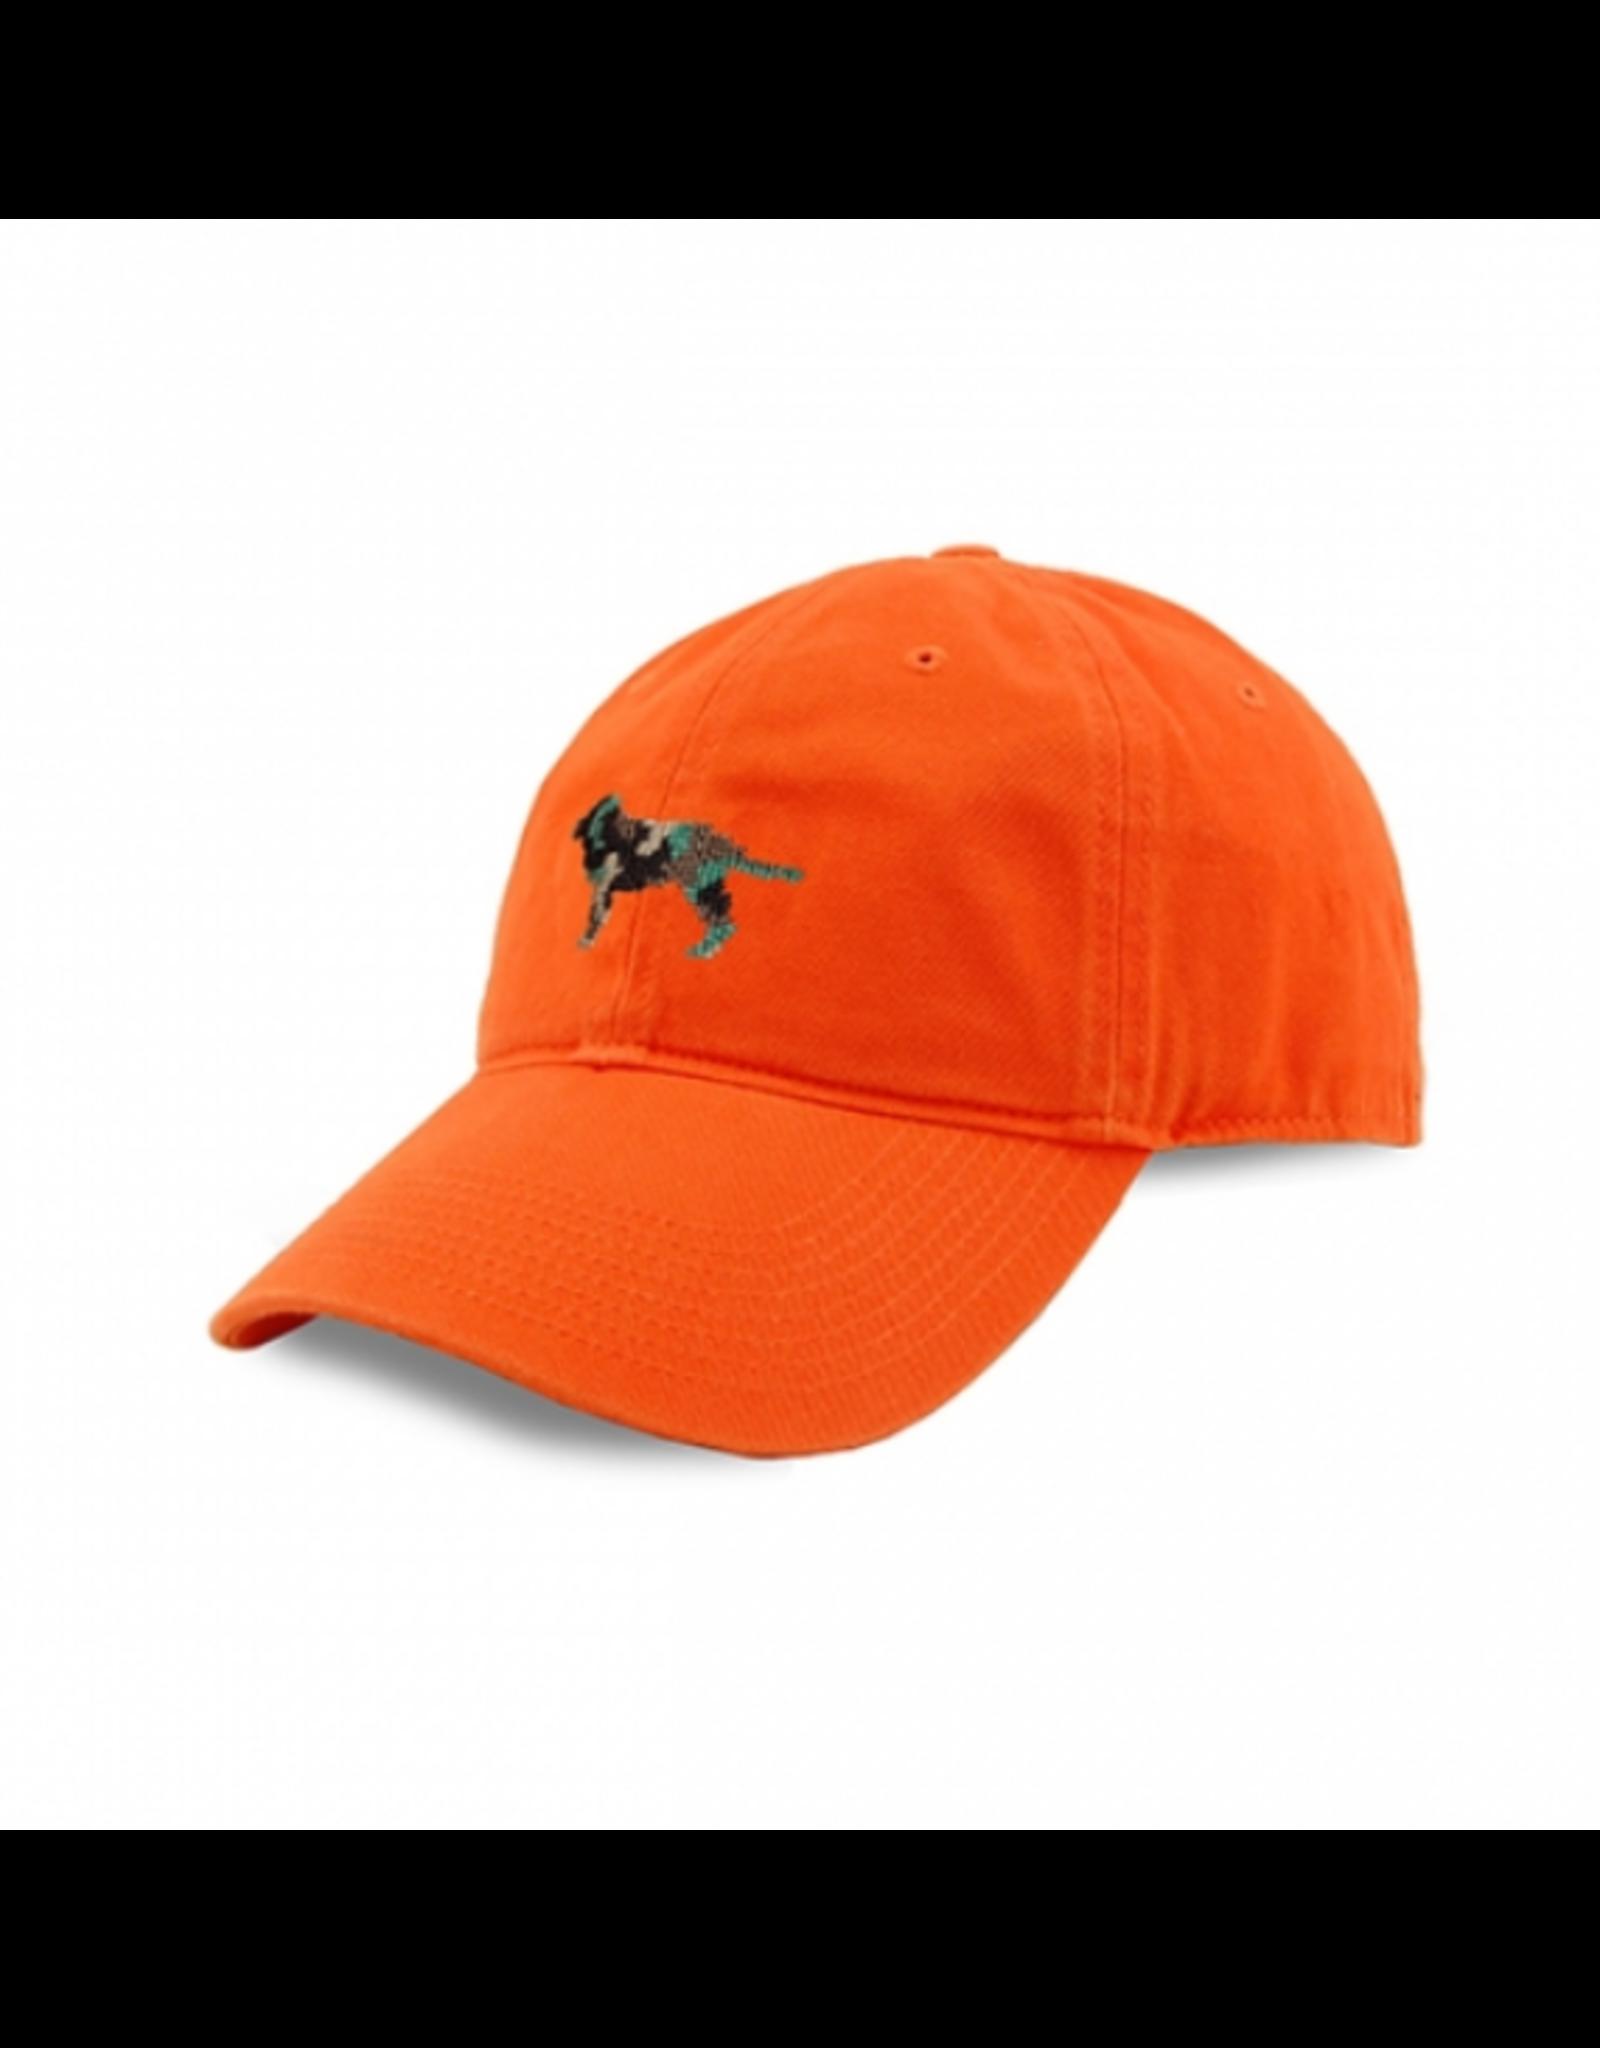 Smathers & Branson S&B Needlepoint Ball Hat, Camo Retriever on Orange